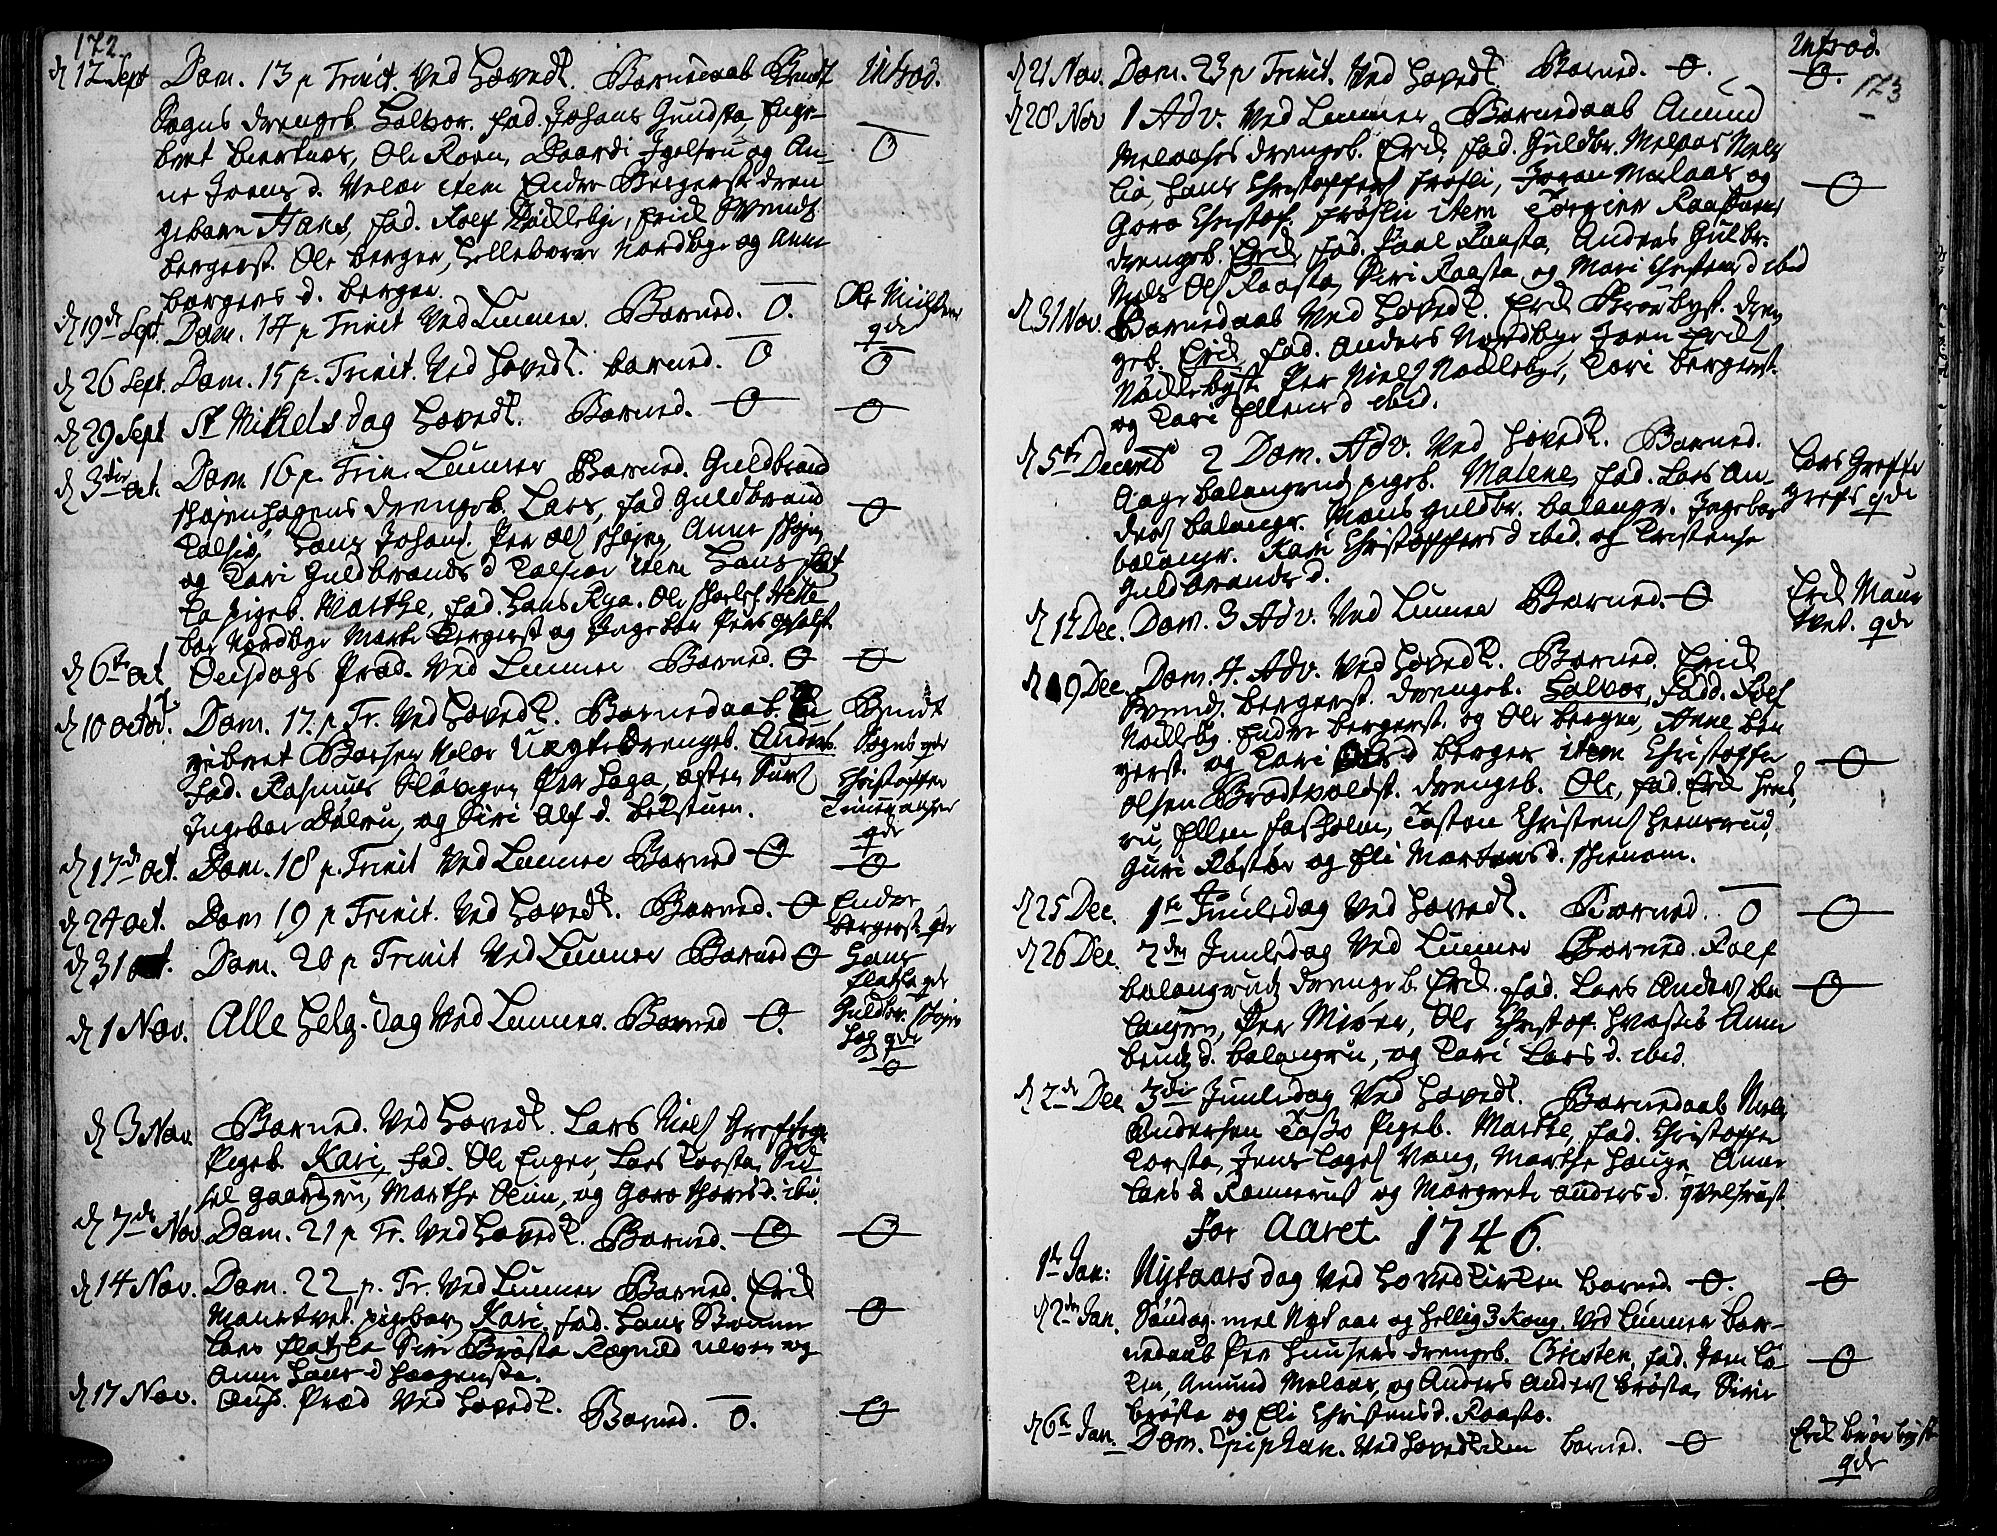 SAH, Jevnaker prestekontor, Ministerialbok nr. 2, 1725-1751, s. 172-173